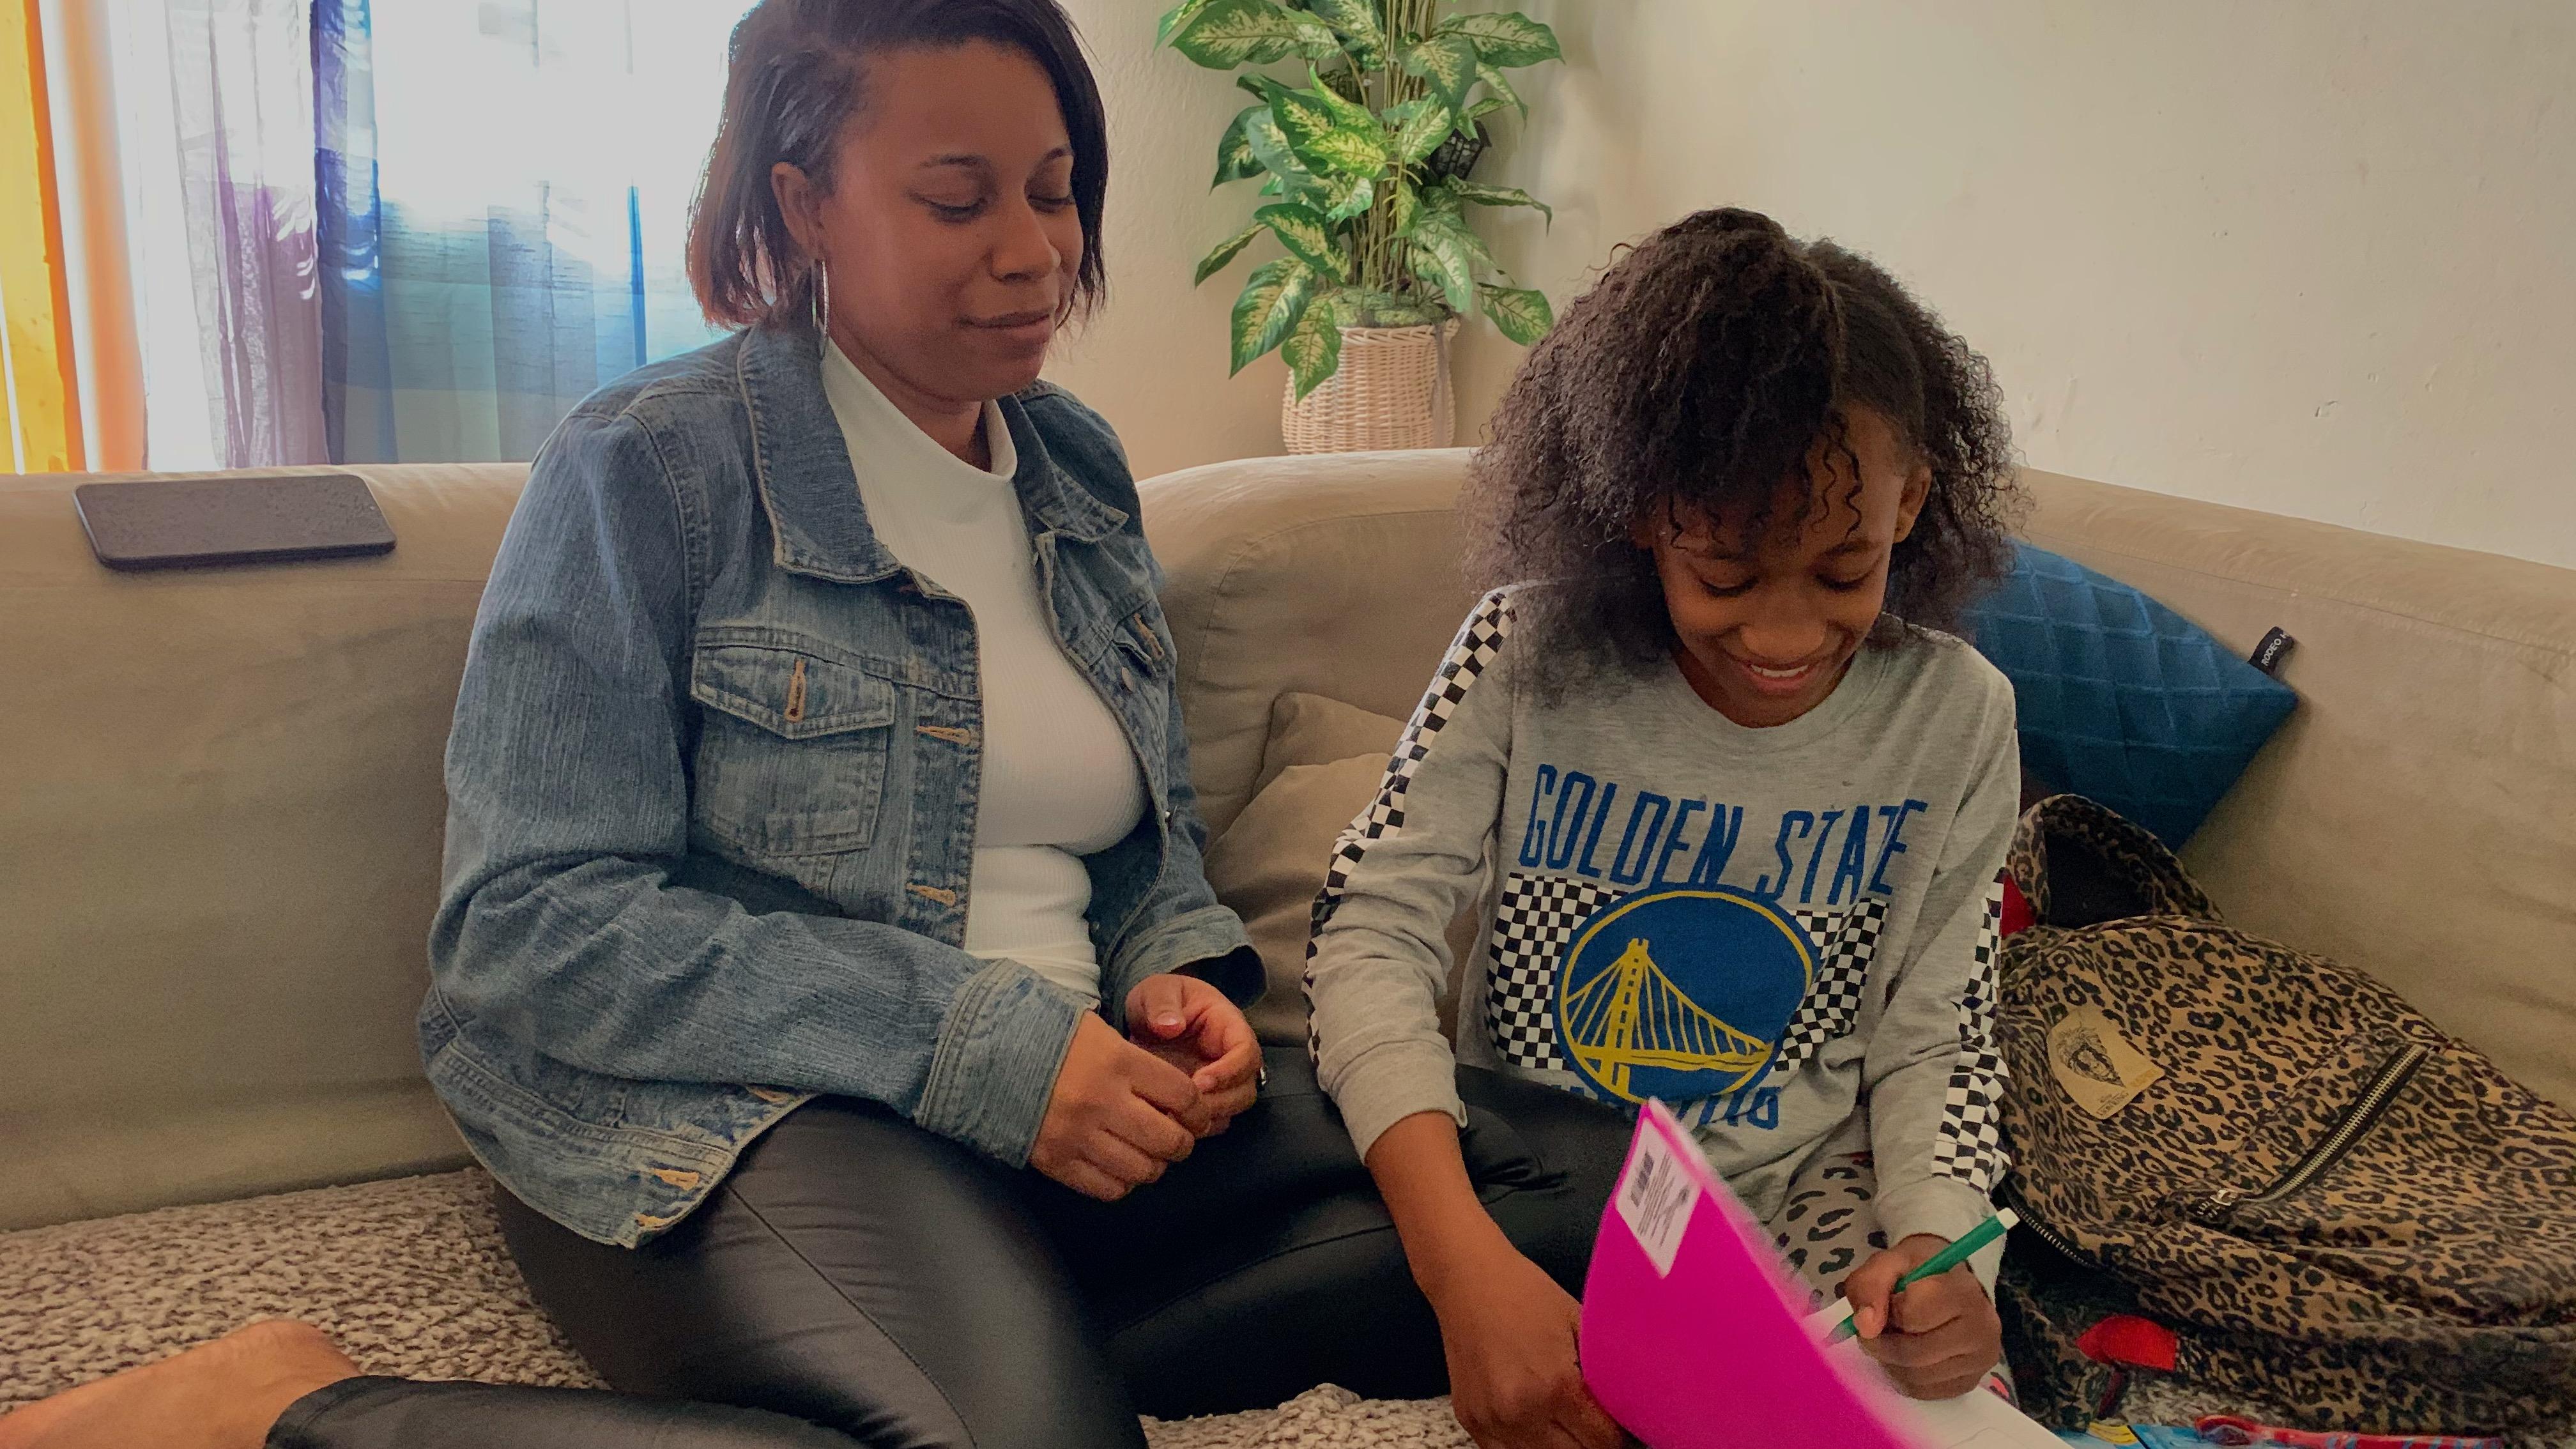 Caption: Ta'Kira Dannette Byrd, 11-year-old Vallejo girl and Shawntierra Dolton, Ta'Kira's mother in 2020. , Credit: Lee Romney